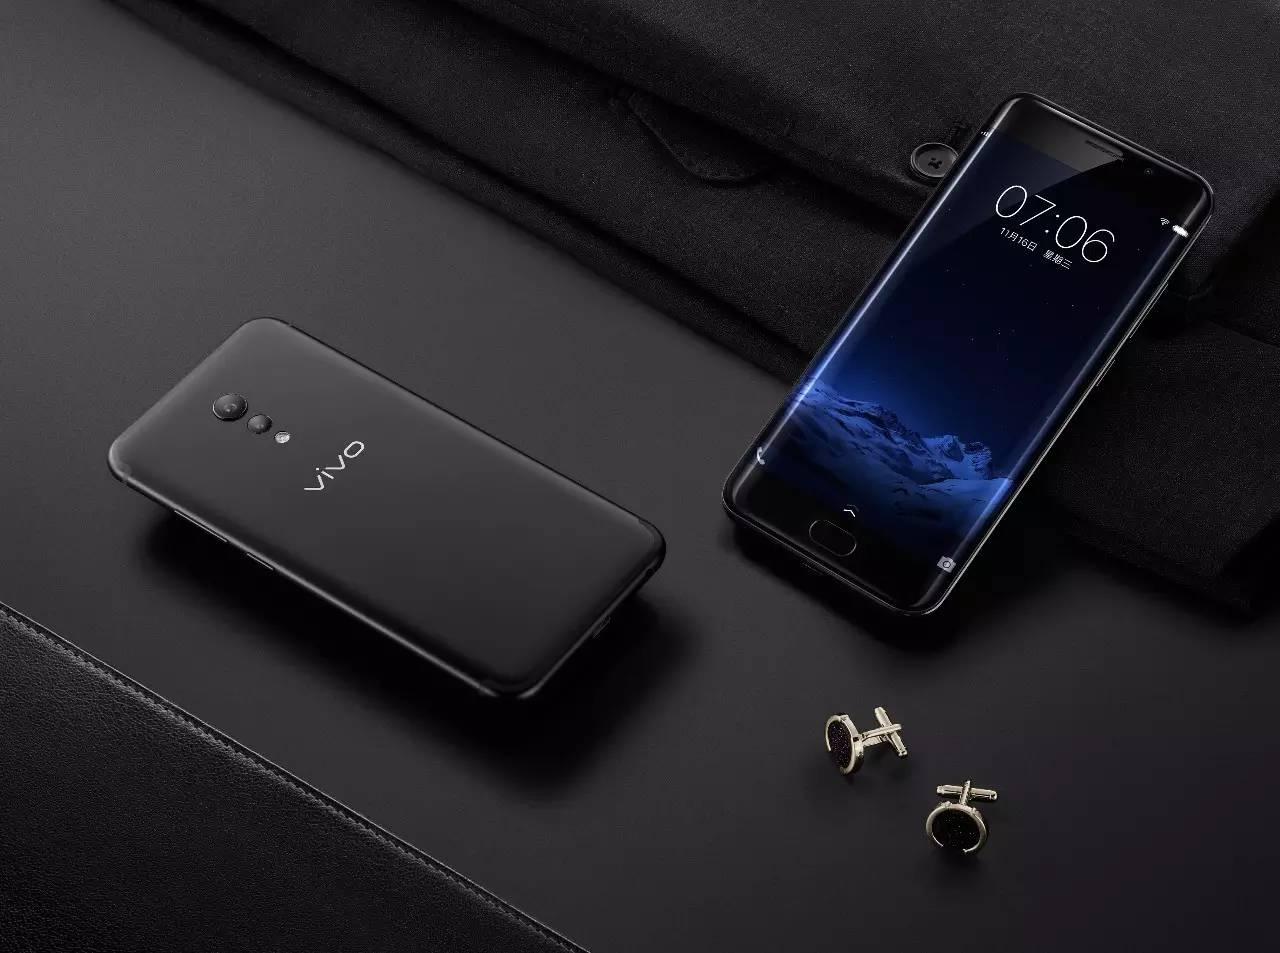 vivo发布Xplay 6磨砂黑,你会为手机颜色买单吗?| 钛快讯